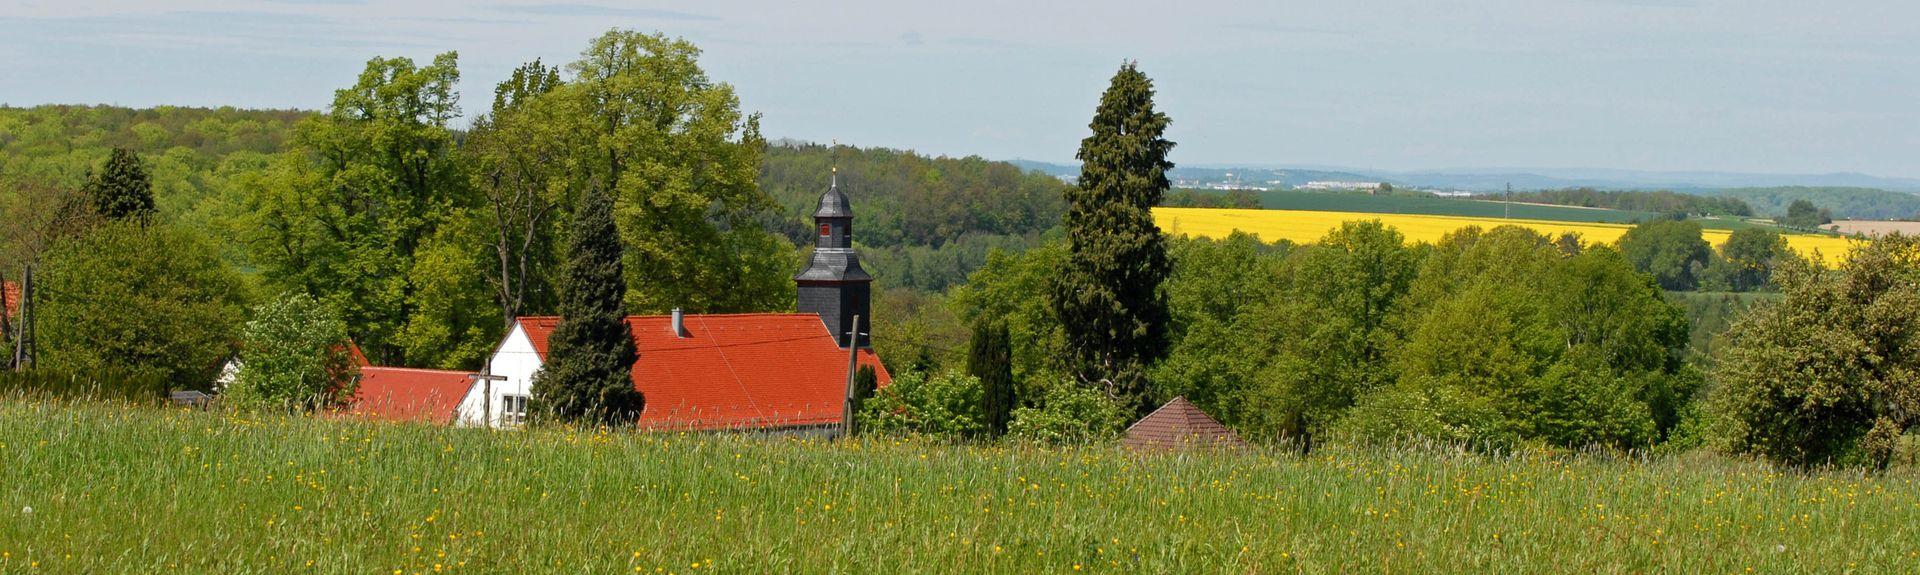 Zweibrücken, Renania - Palatinato, Germania